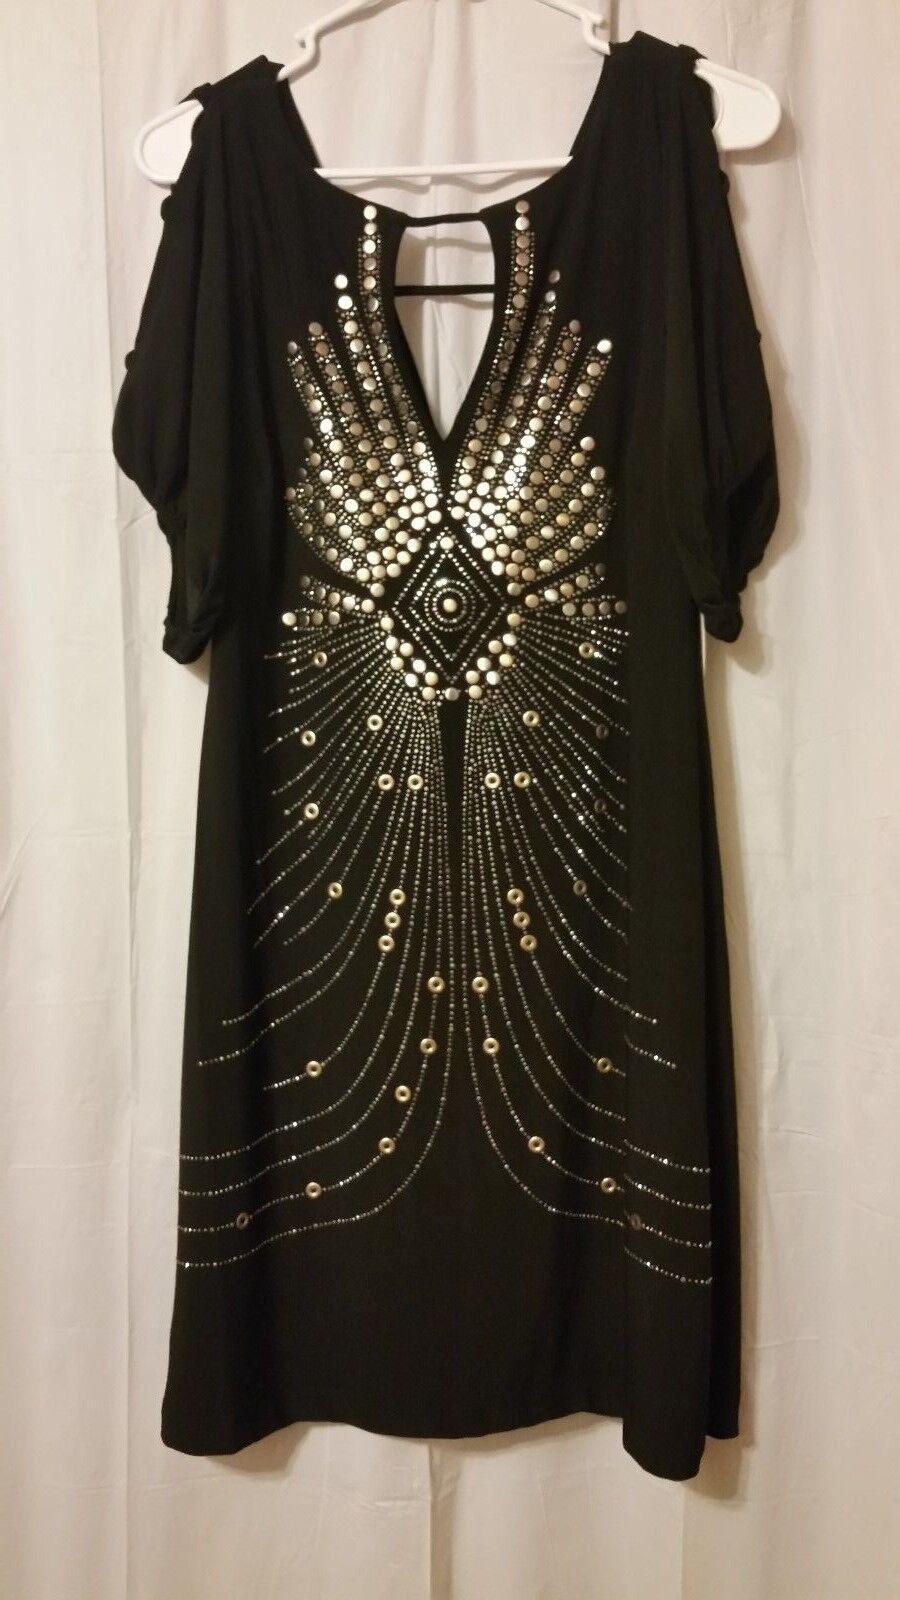 Bisou Bisou - schwarz Dress With Metallic Stud Burst Bling - Größe 8  NWT     DC2